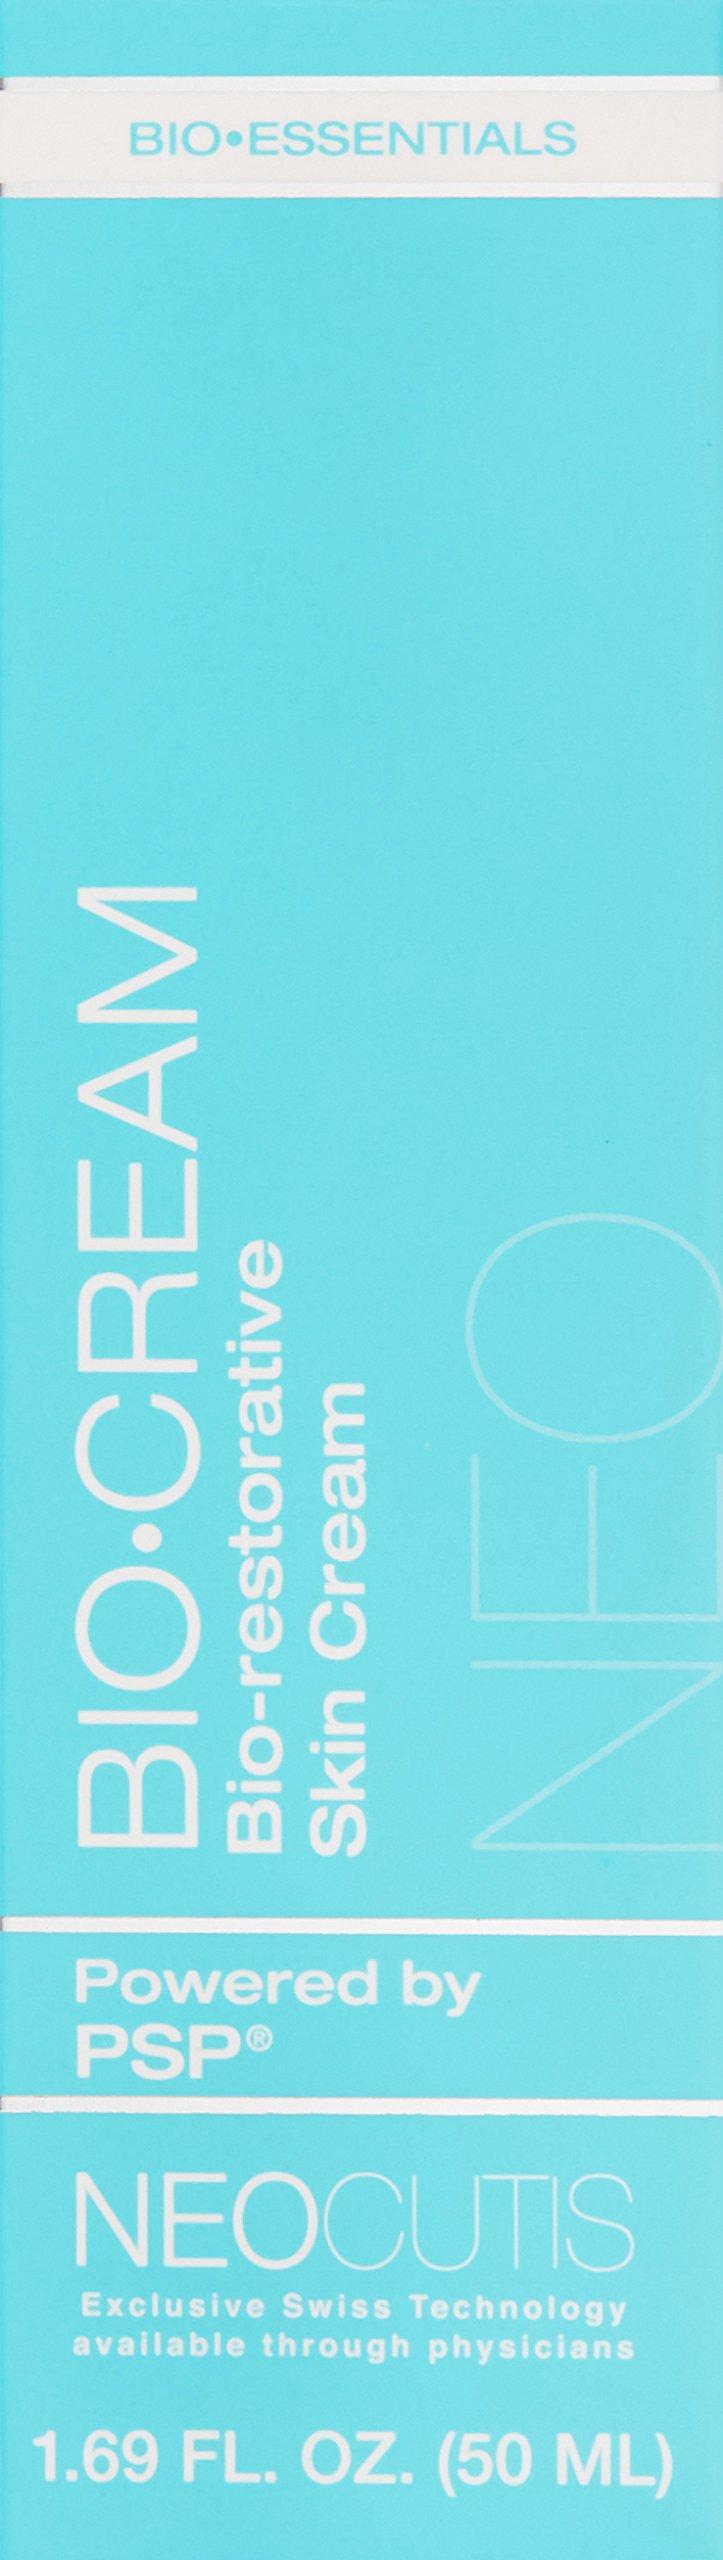 NEOCUTIS Bio-Cream Bio-restorative Skin Cream with PSP, 1.69 Fl Oz by NEOCUTIS (Image #3)